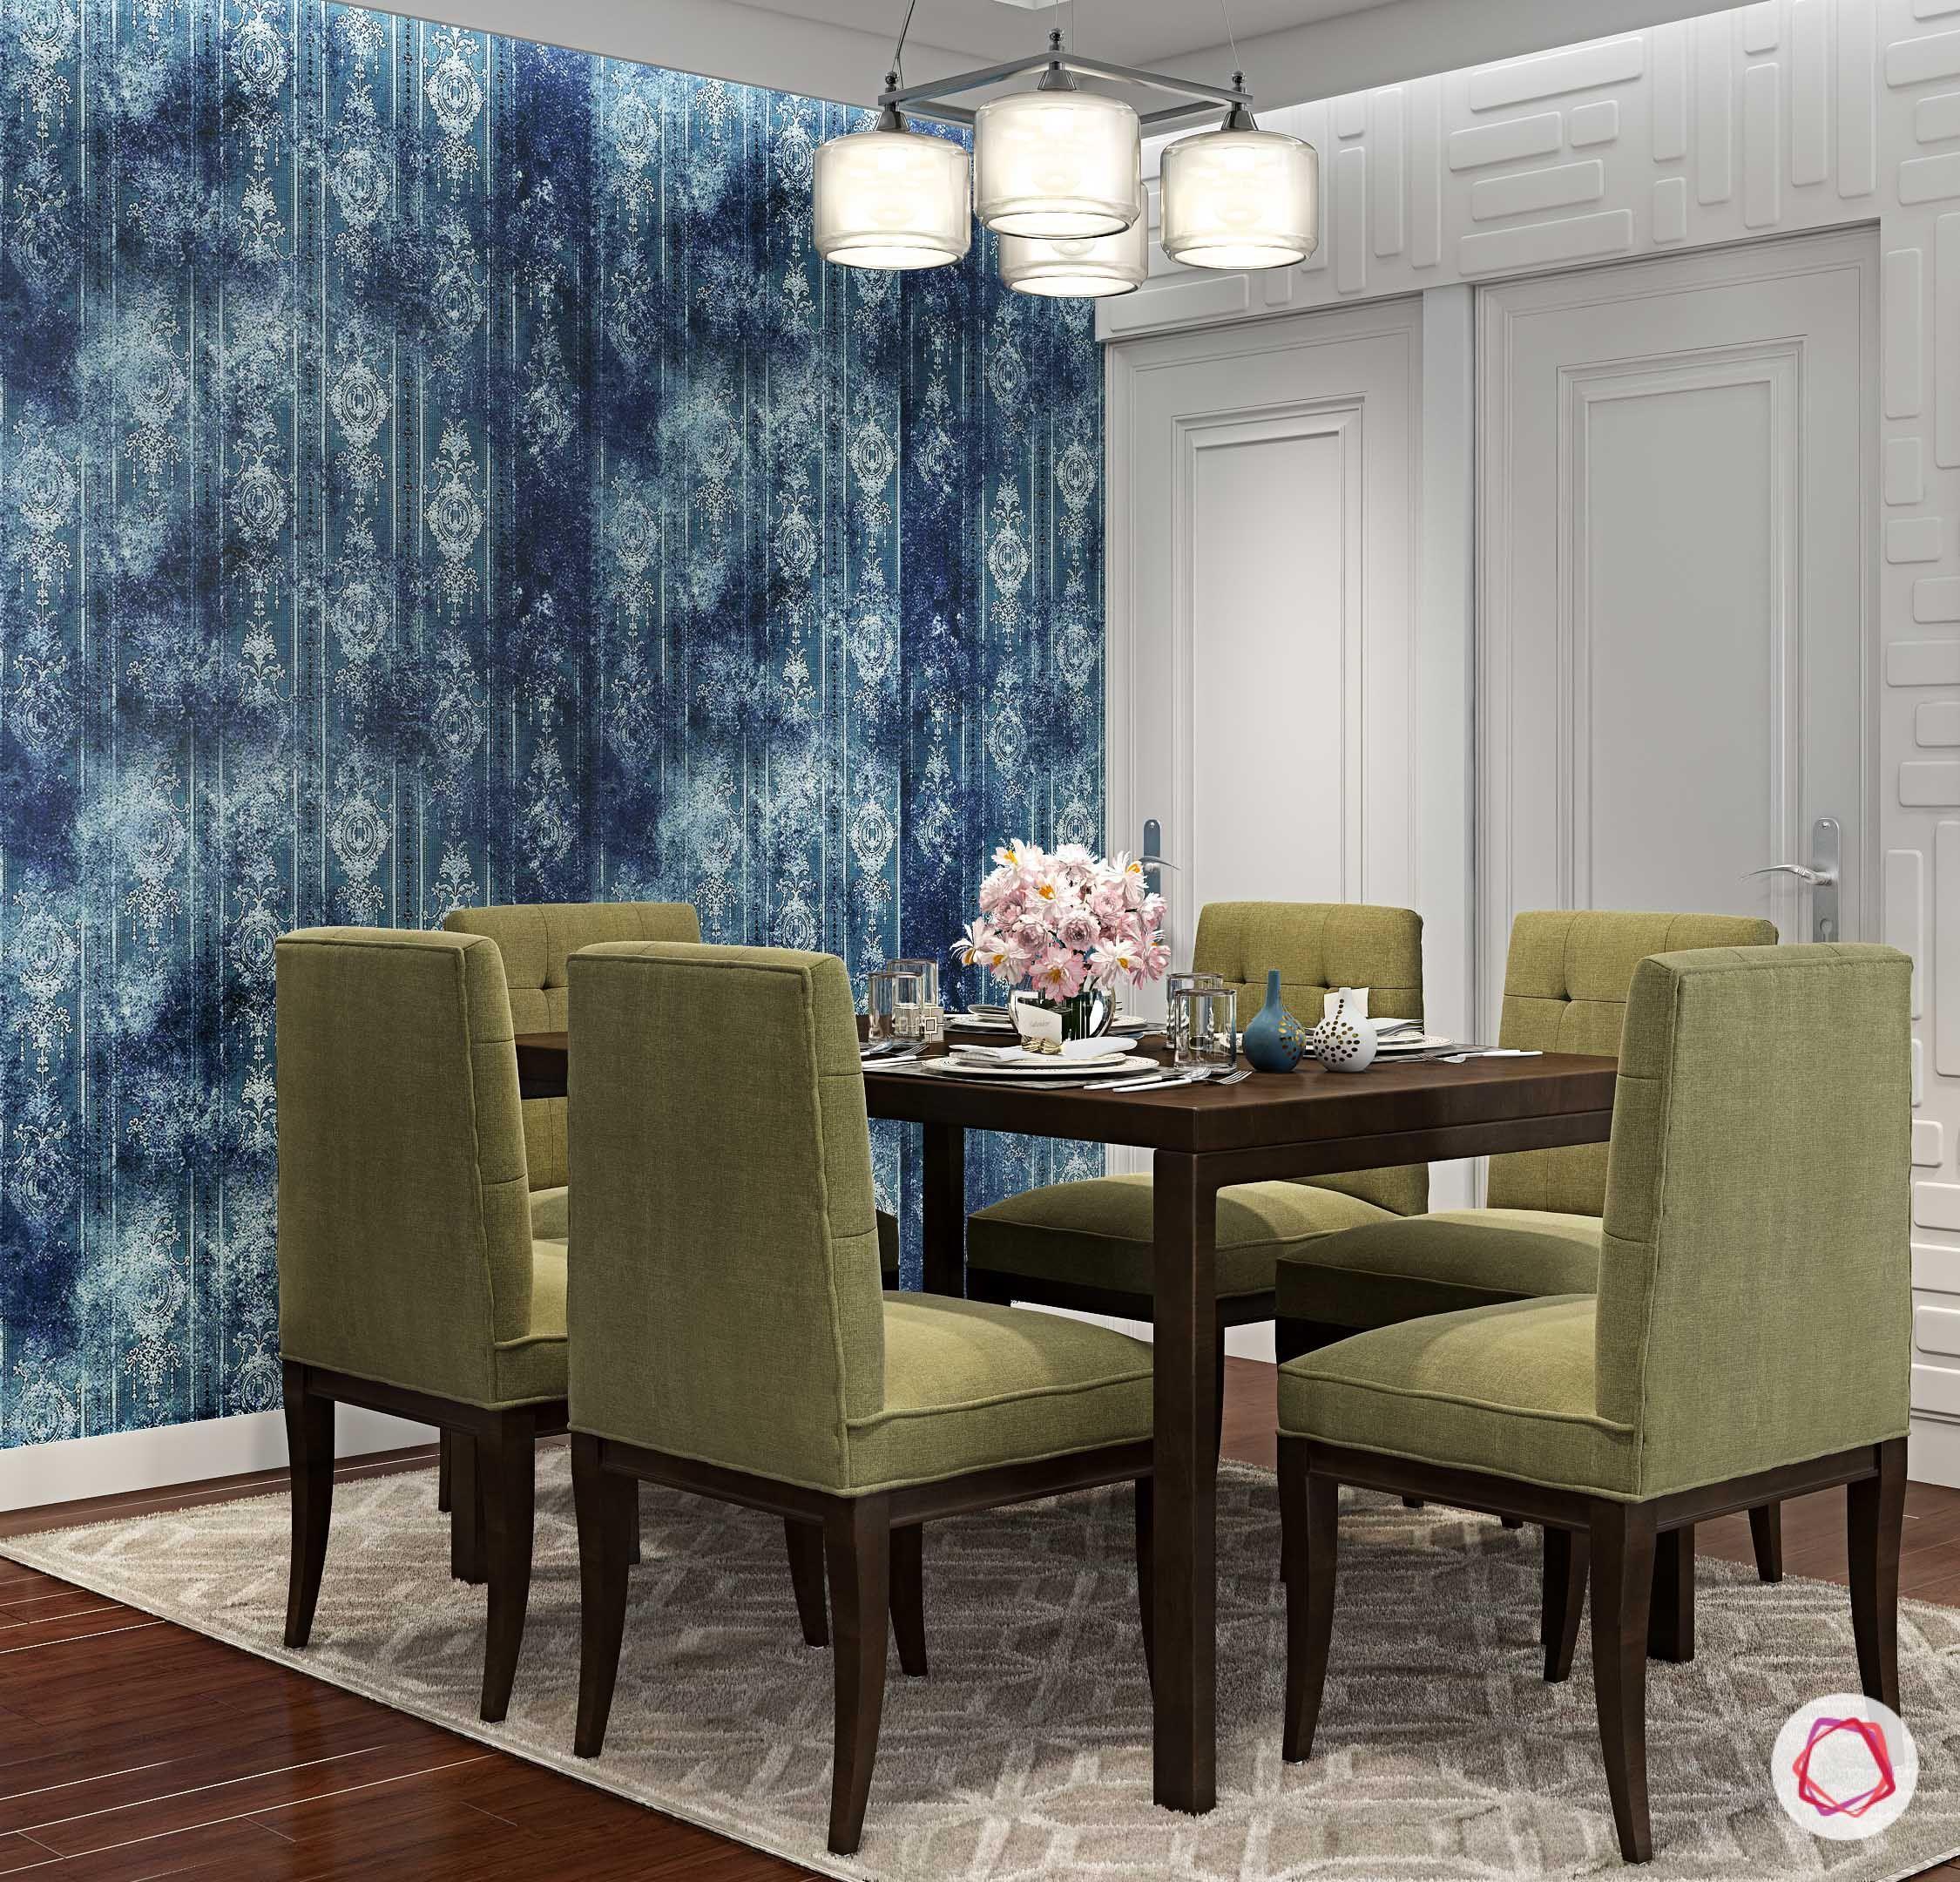 Diningroom Green Forest Blue Wallpaper Eclectic India Dining Room Design Best Dining Dining Room